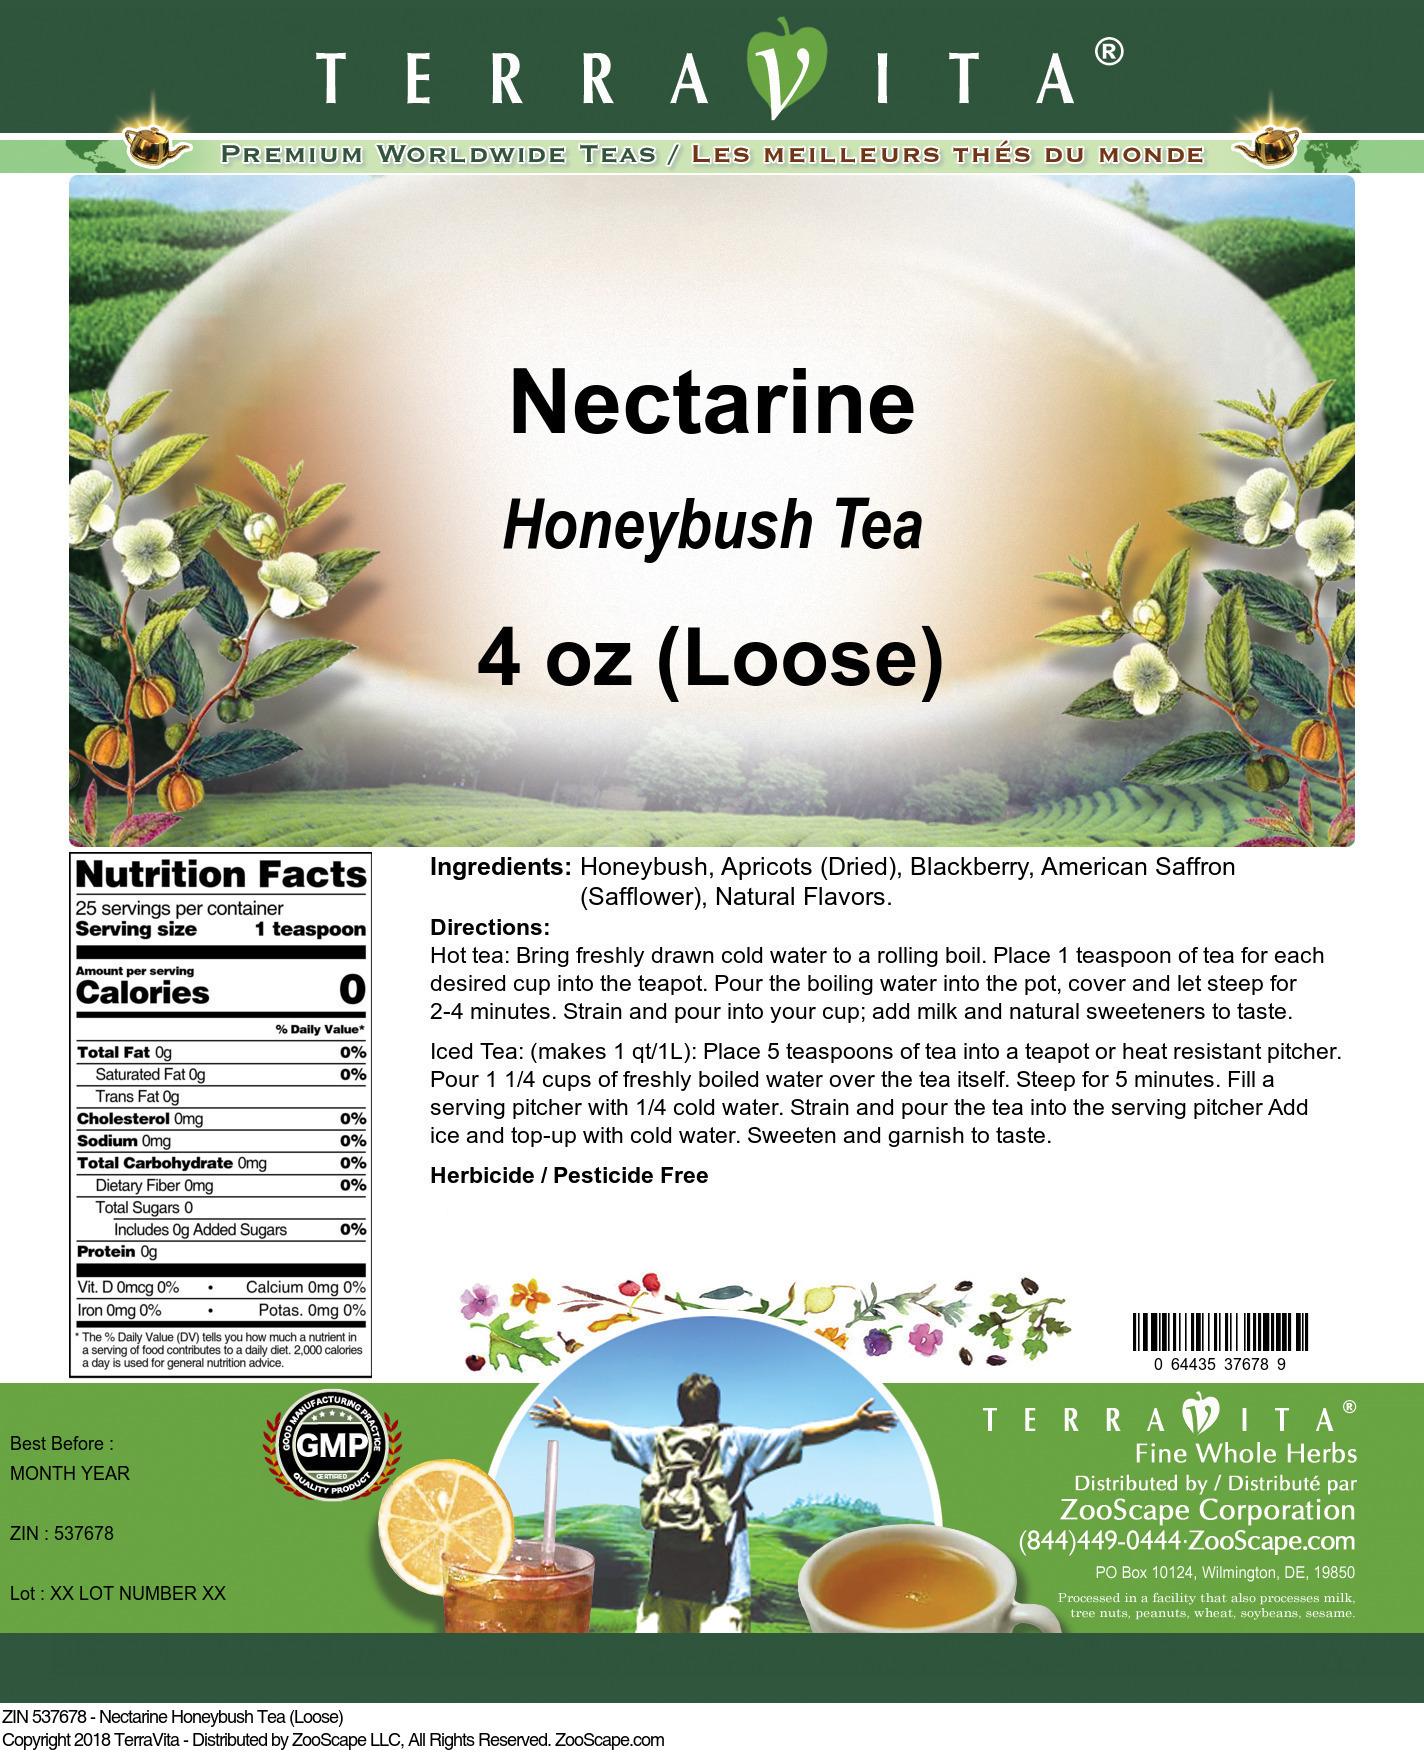 Nectarine Honeybush Tea (Loose)